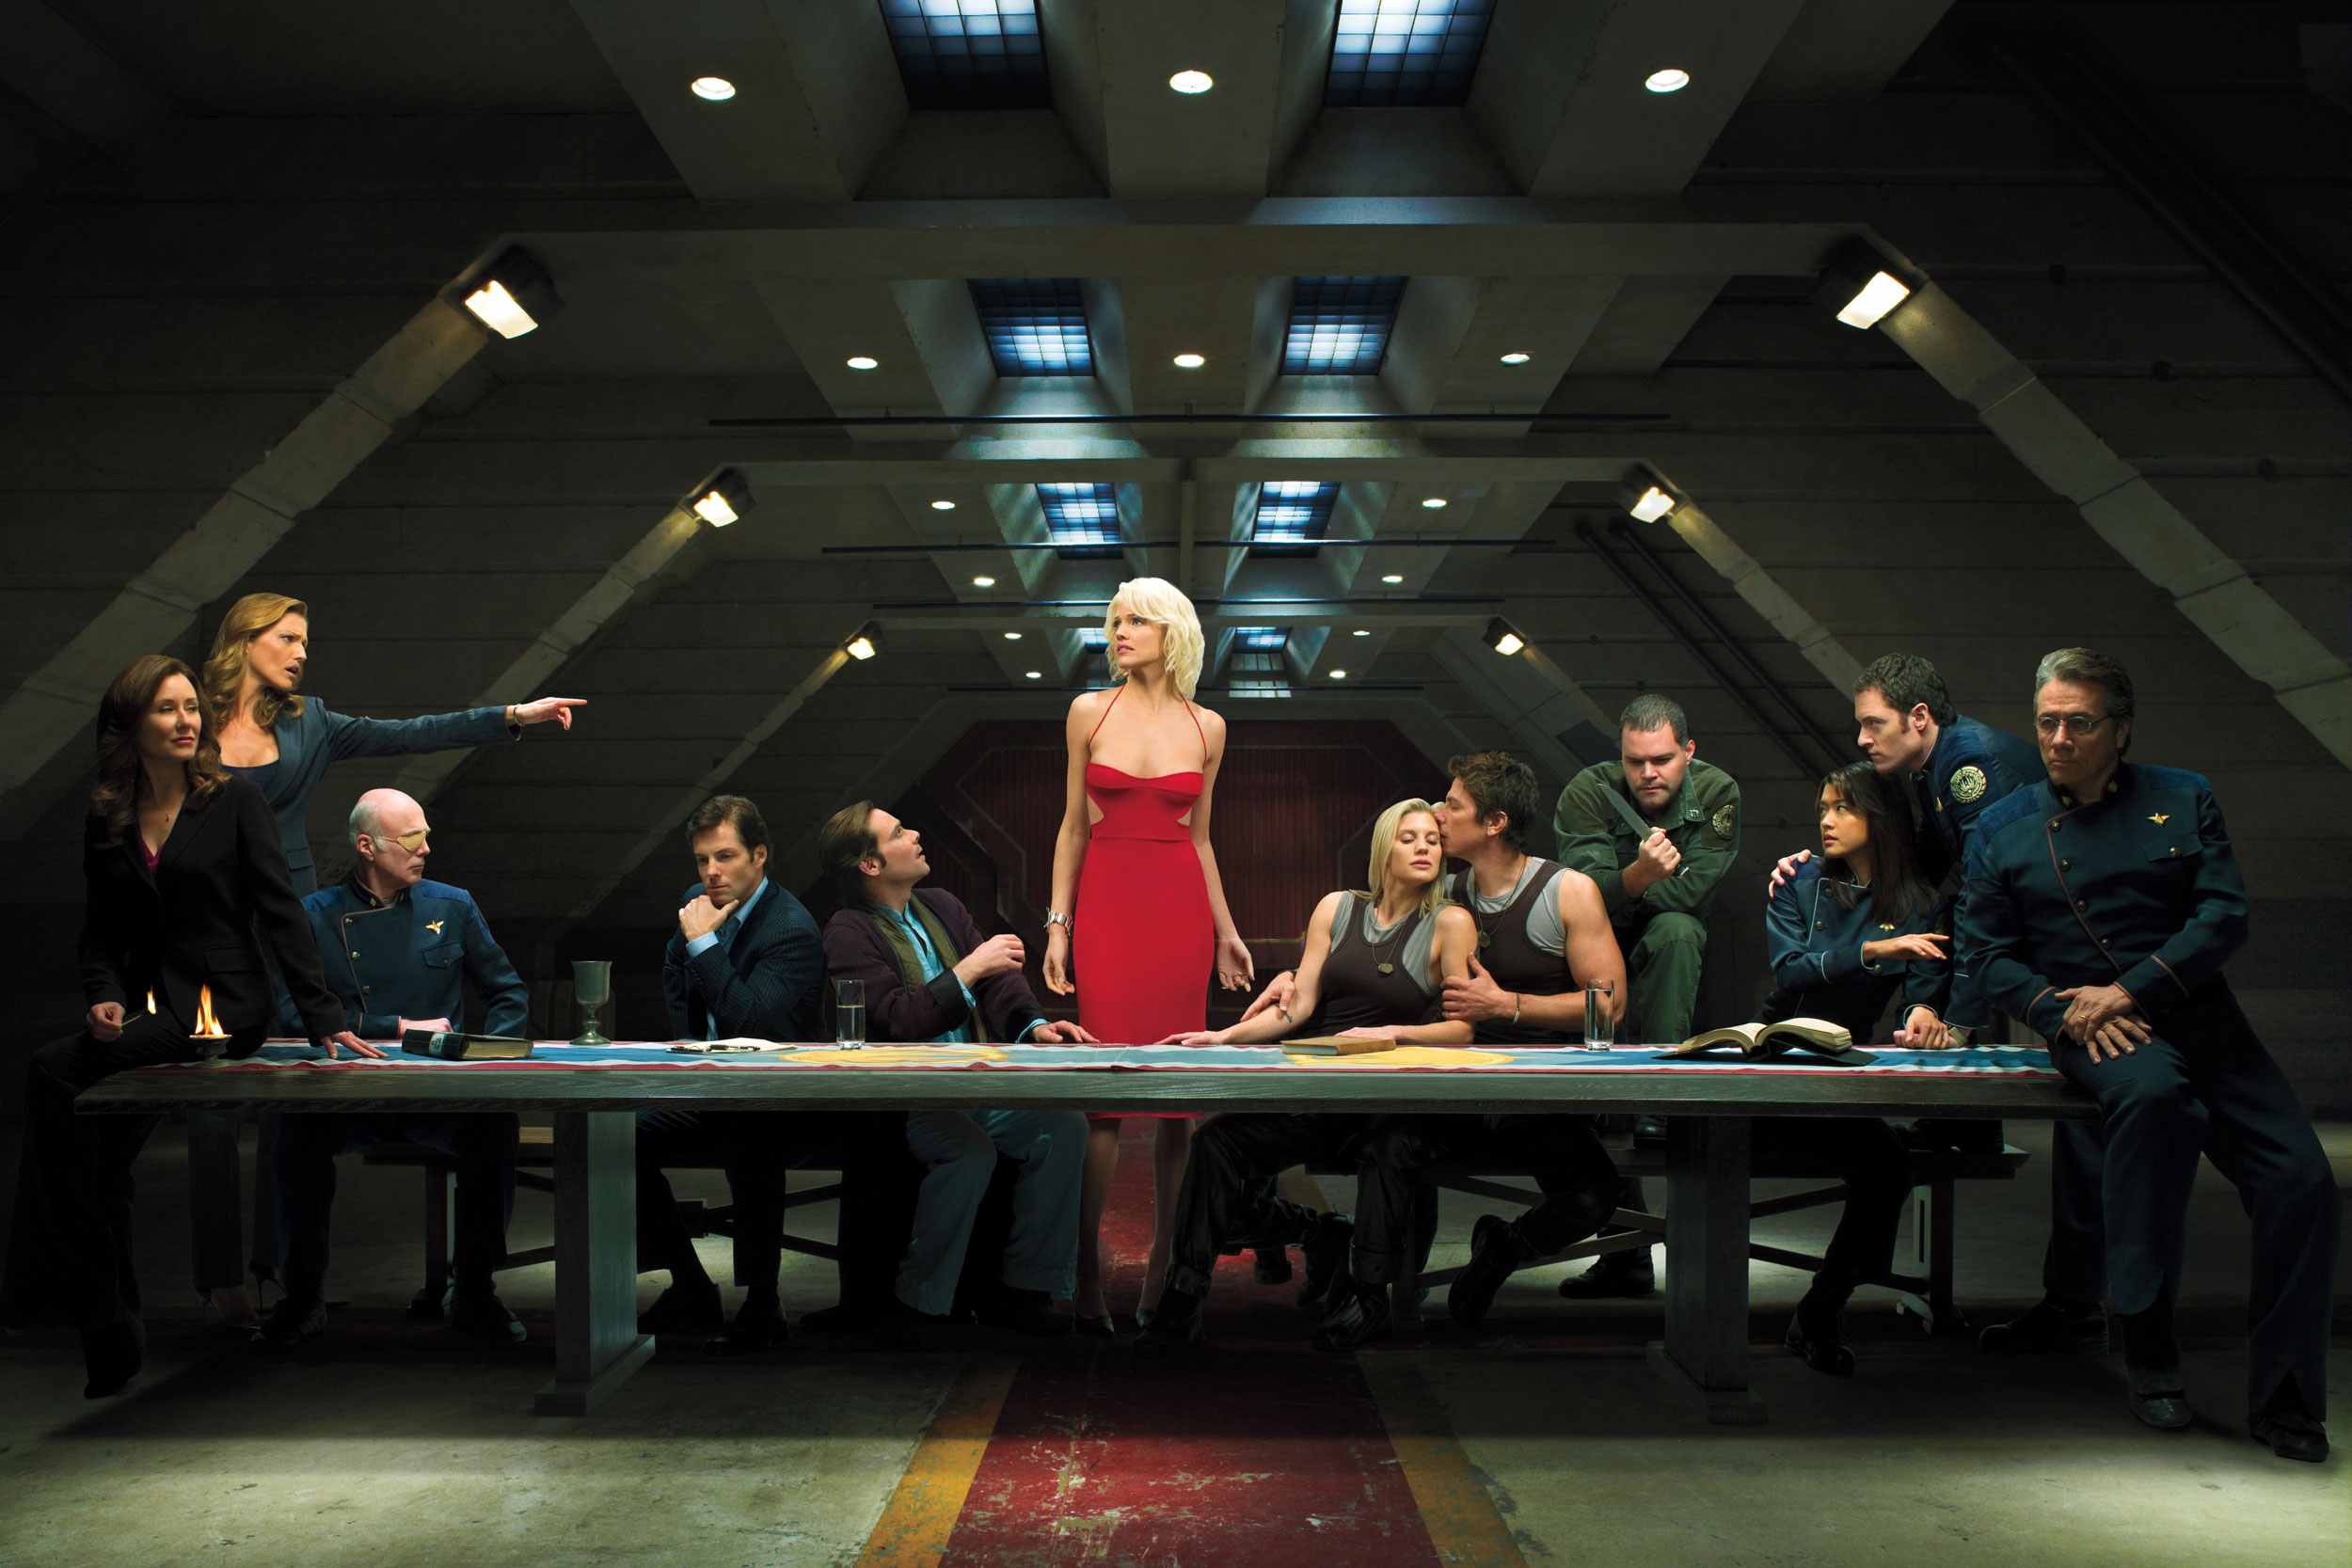 Battlestar Galactica Backgrounds, Compatible - PC, Mobile, Gadgets| 2500x1667 px